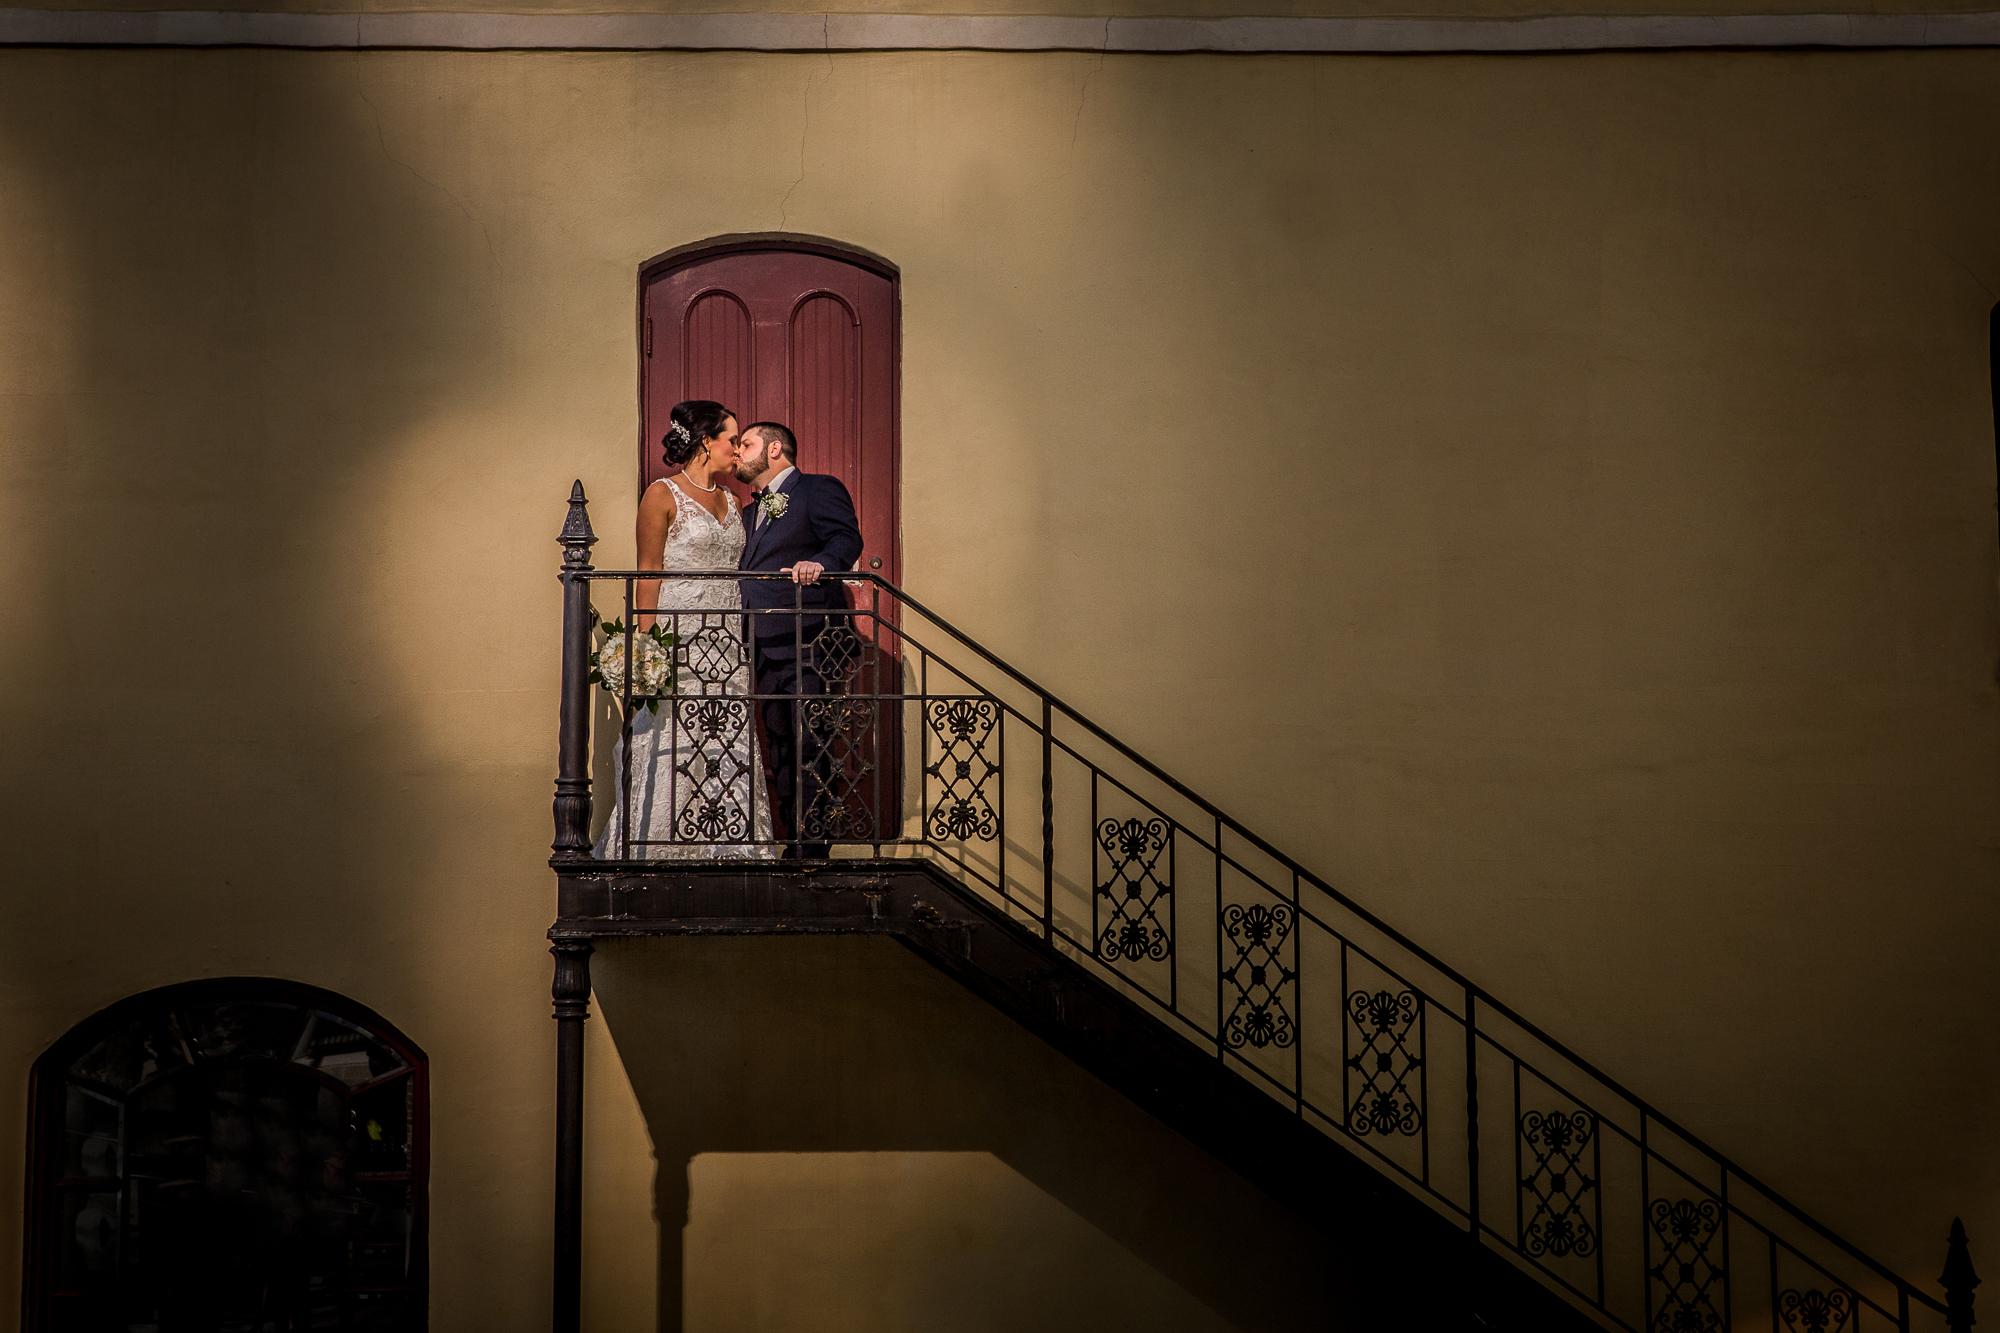 Orlando-Florida-USA-Wedding-Amanda-Ken-1-5.jpg